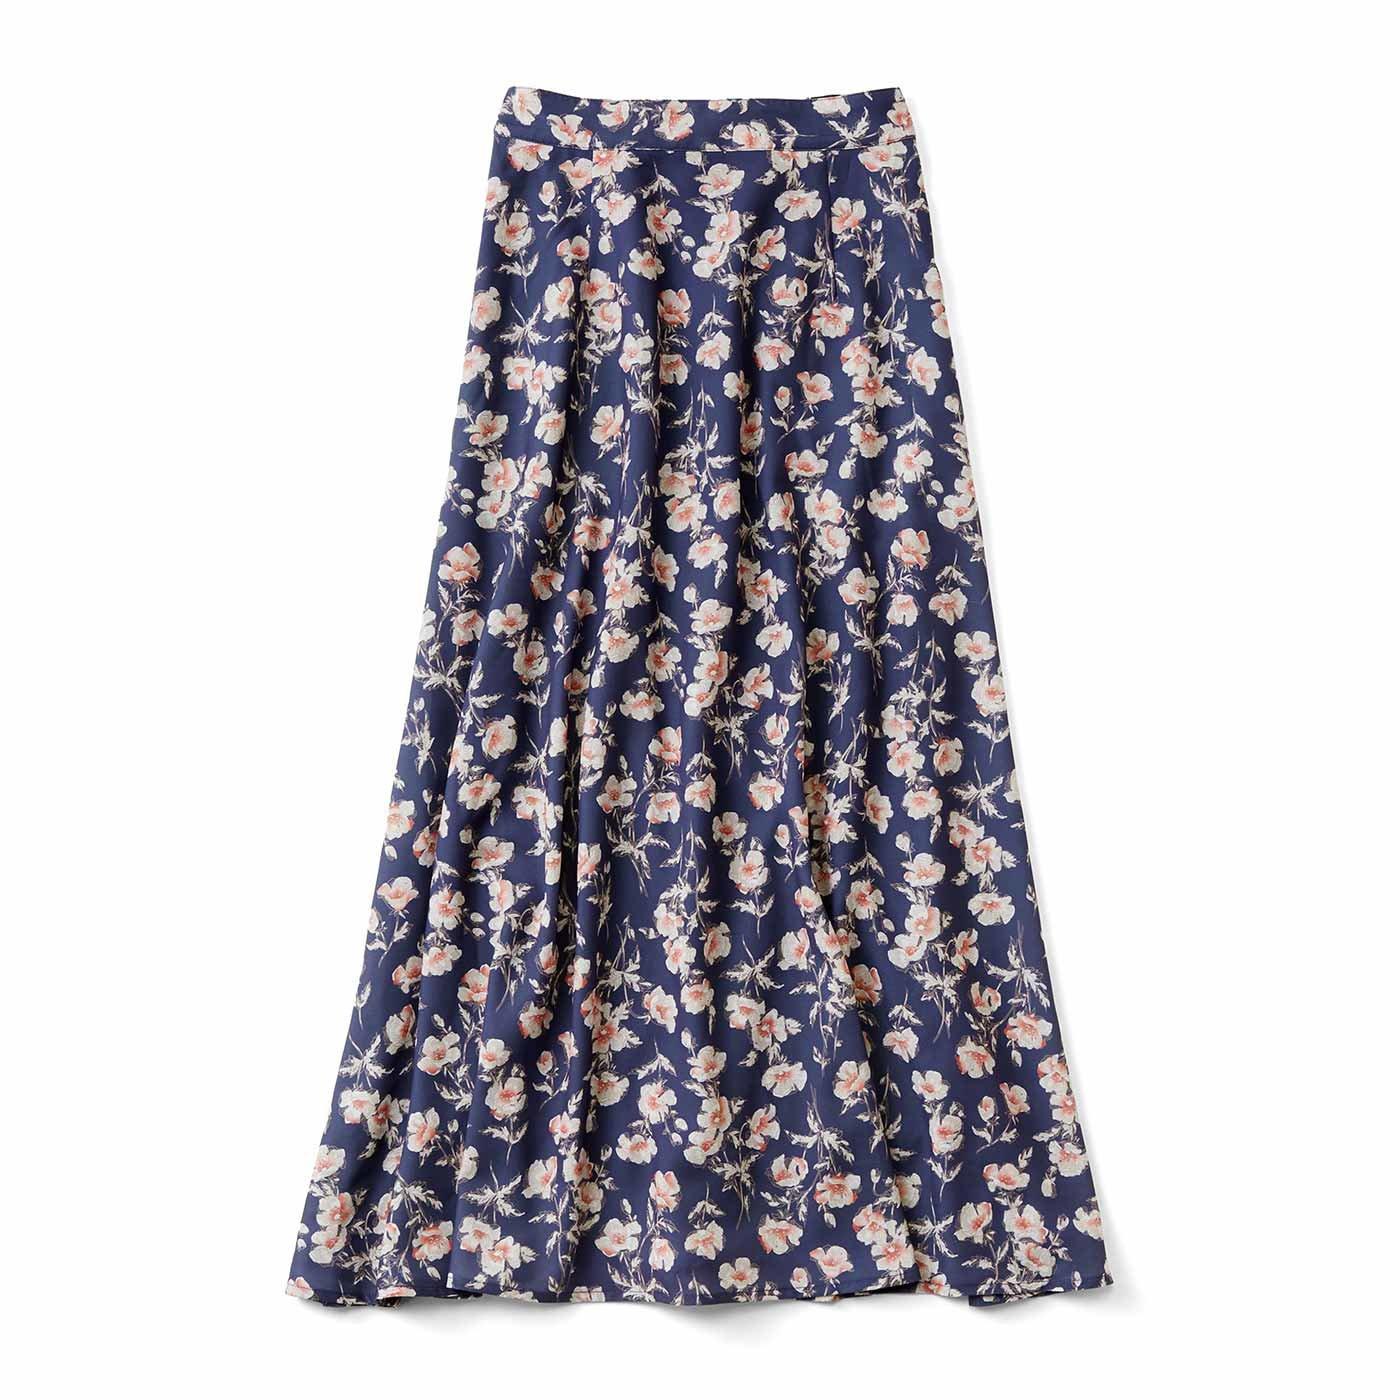 IEDIT[イディット] すらりと細見え ヴィンテージ風フラワープリントスカート〈ネイビー〉